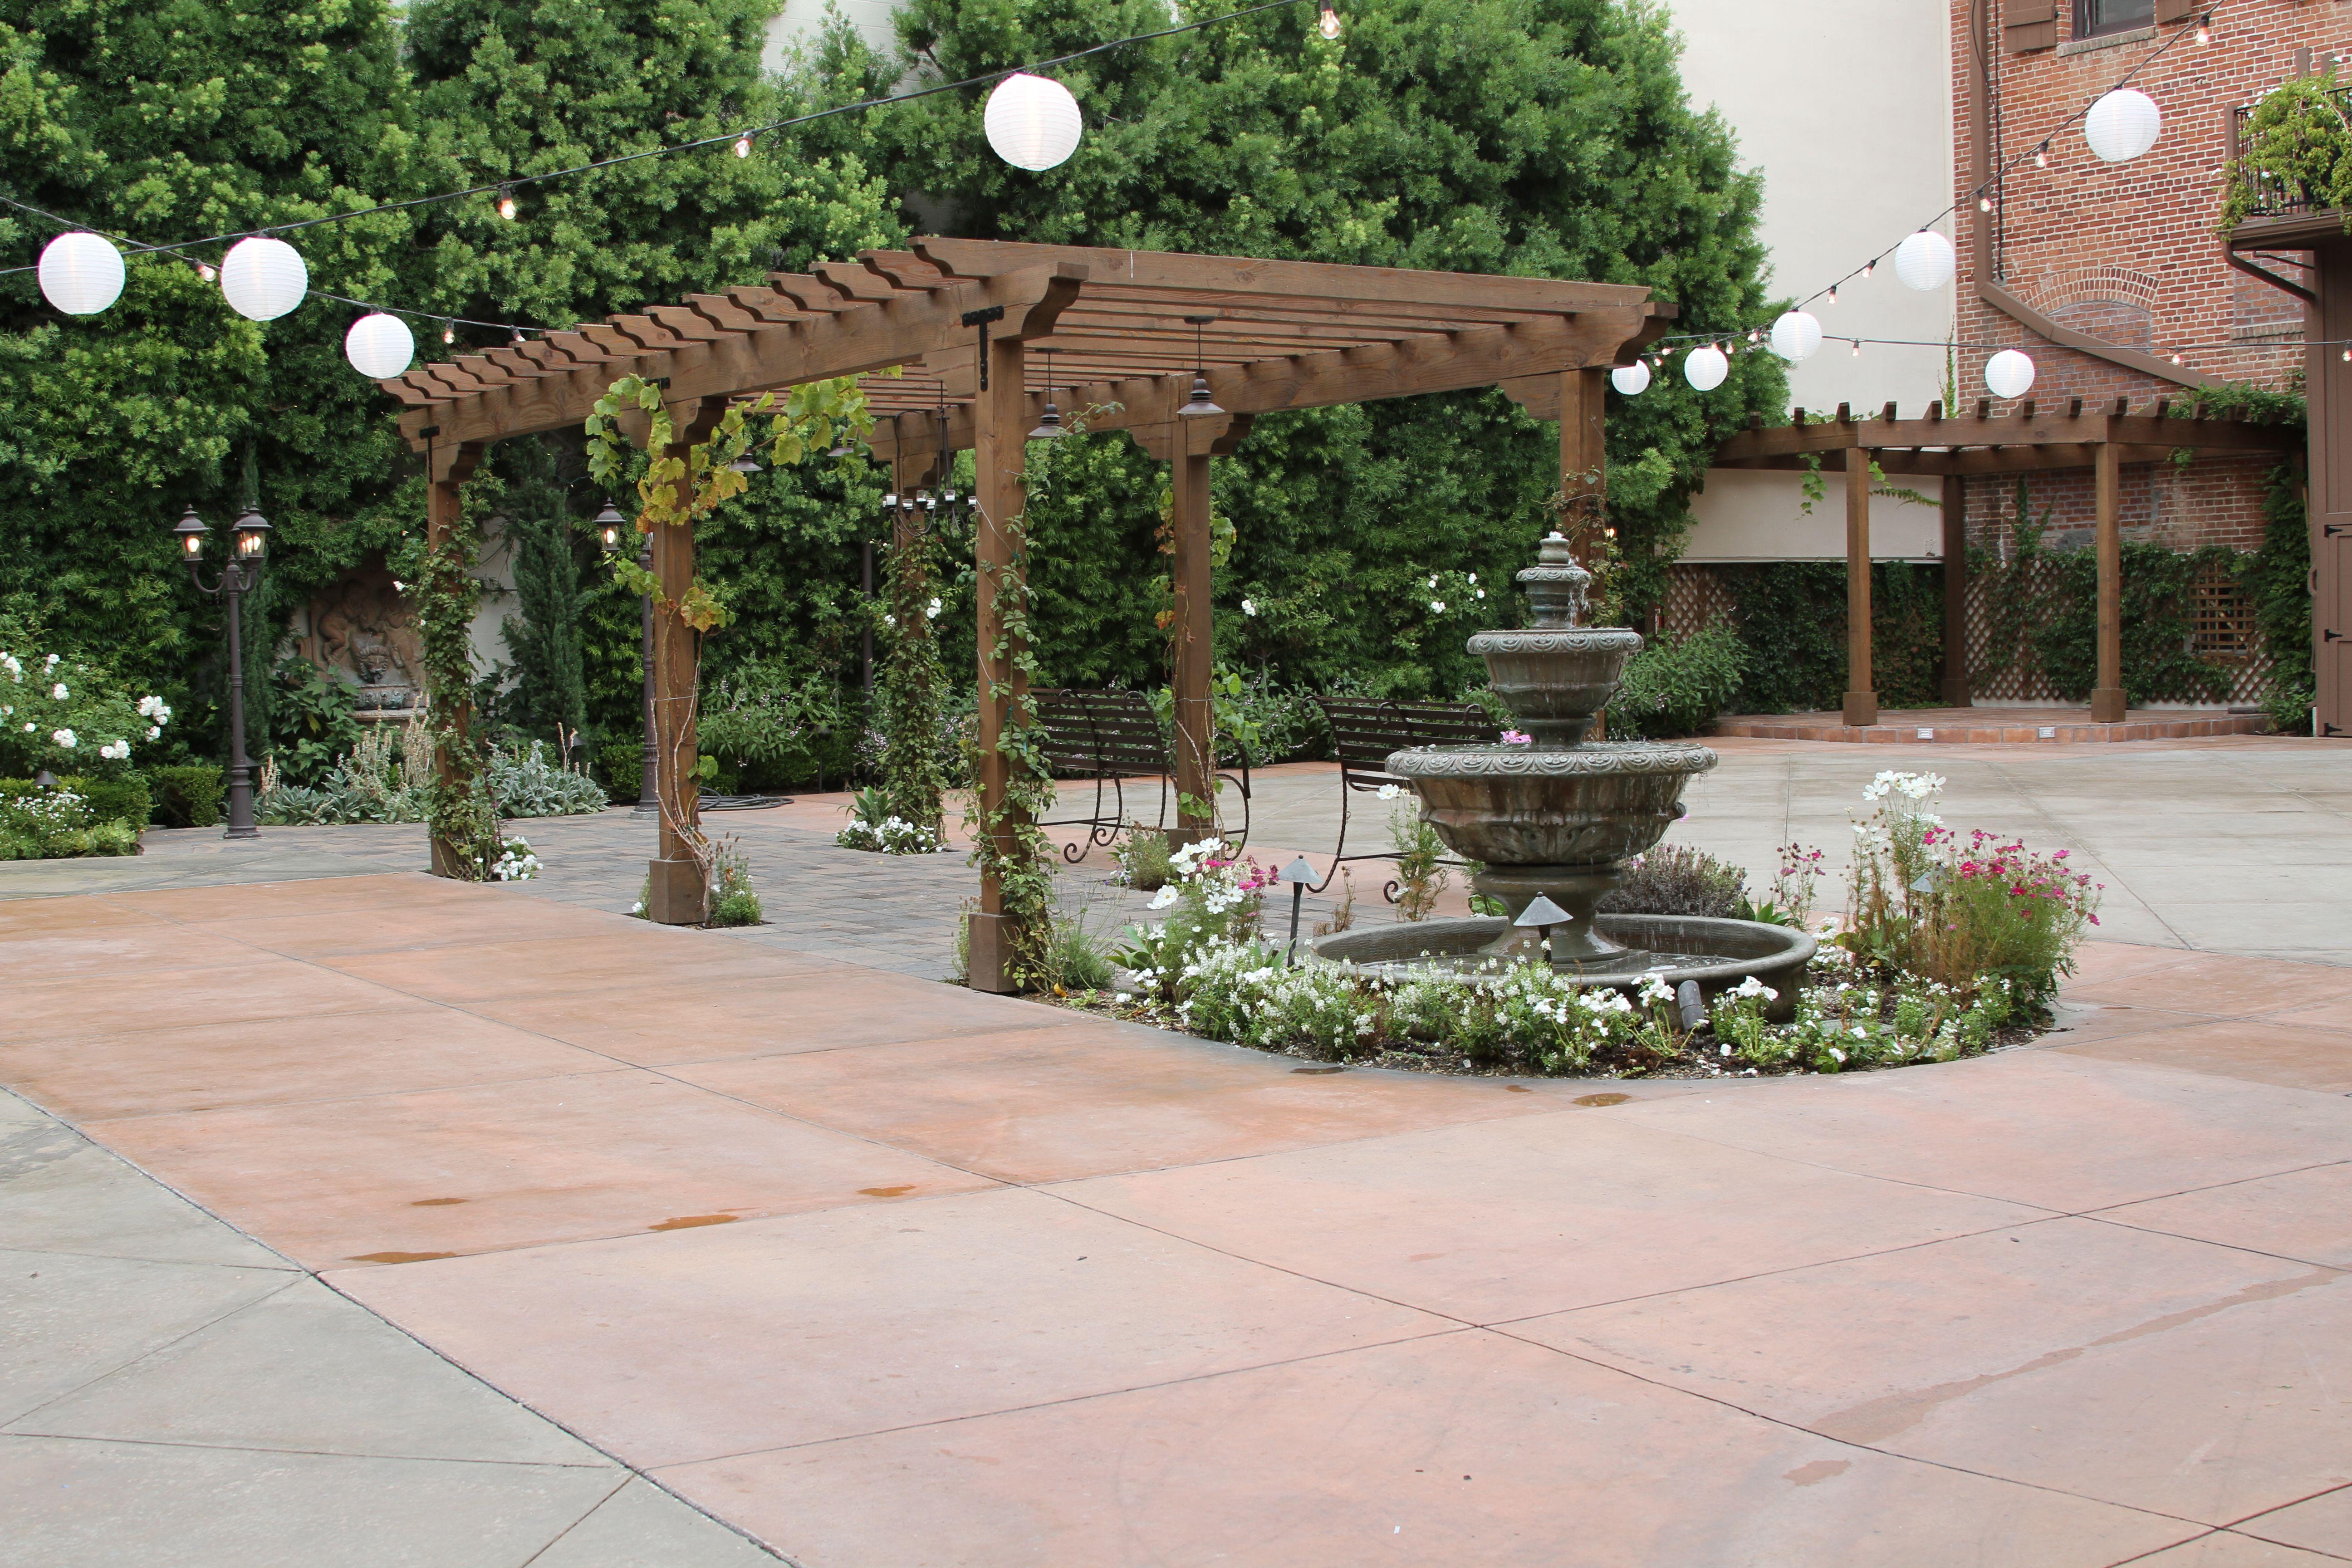 San juan capistrano ca franciscan gardens wedding - Franciscan gardens san juan capistrano ...